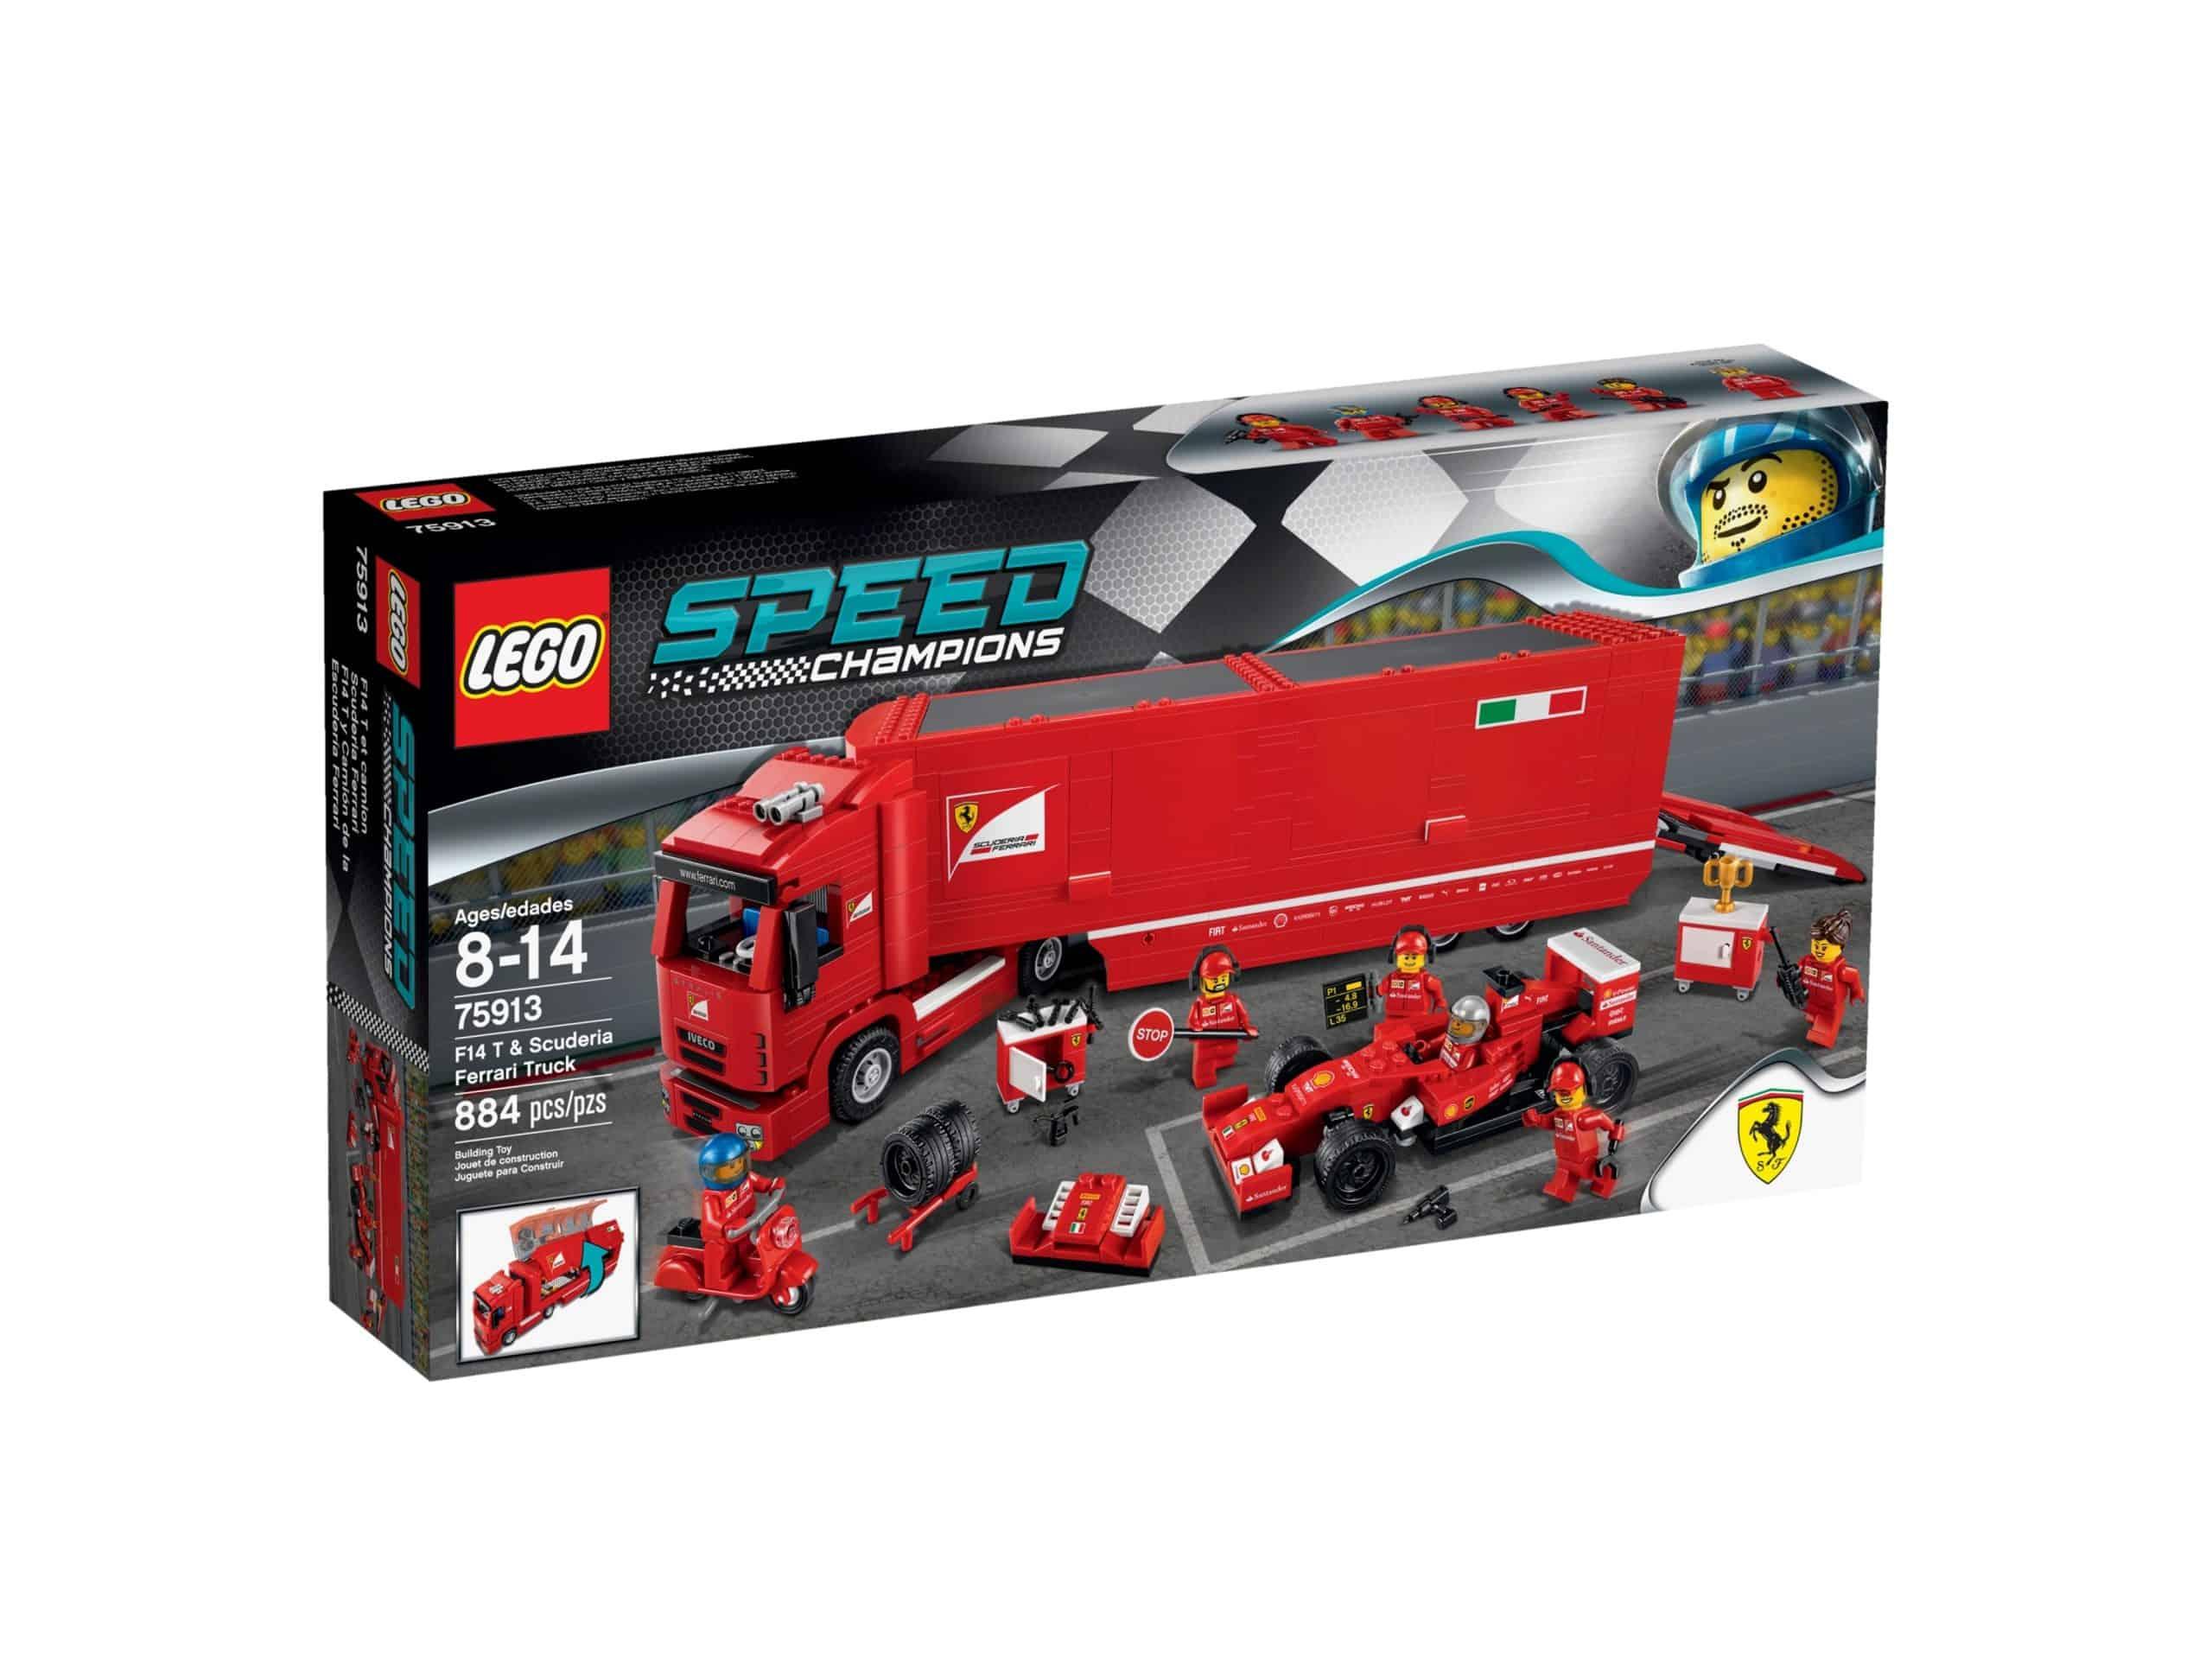 lego 75913 f14 t og scuderia ferrari truck scaled